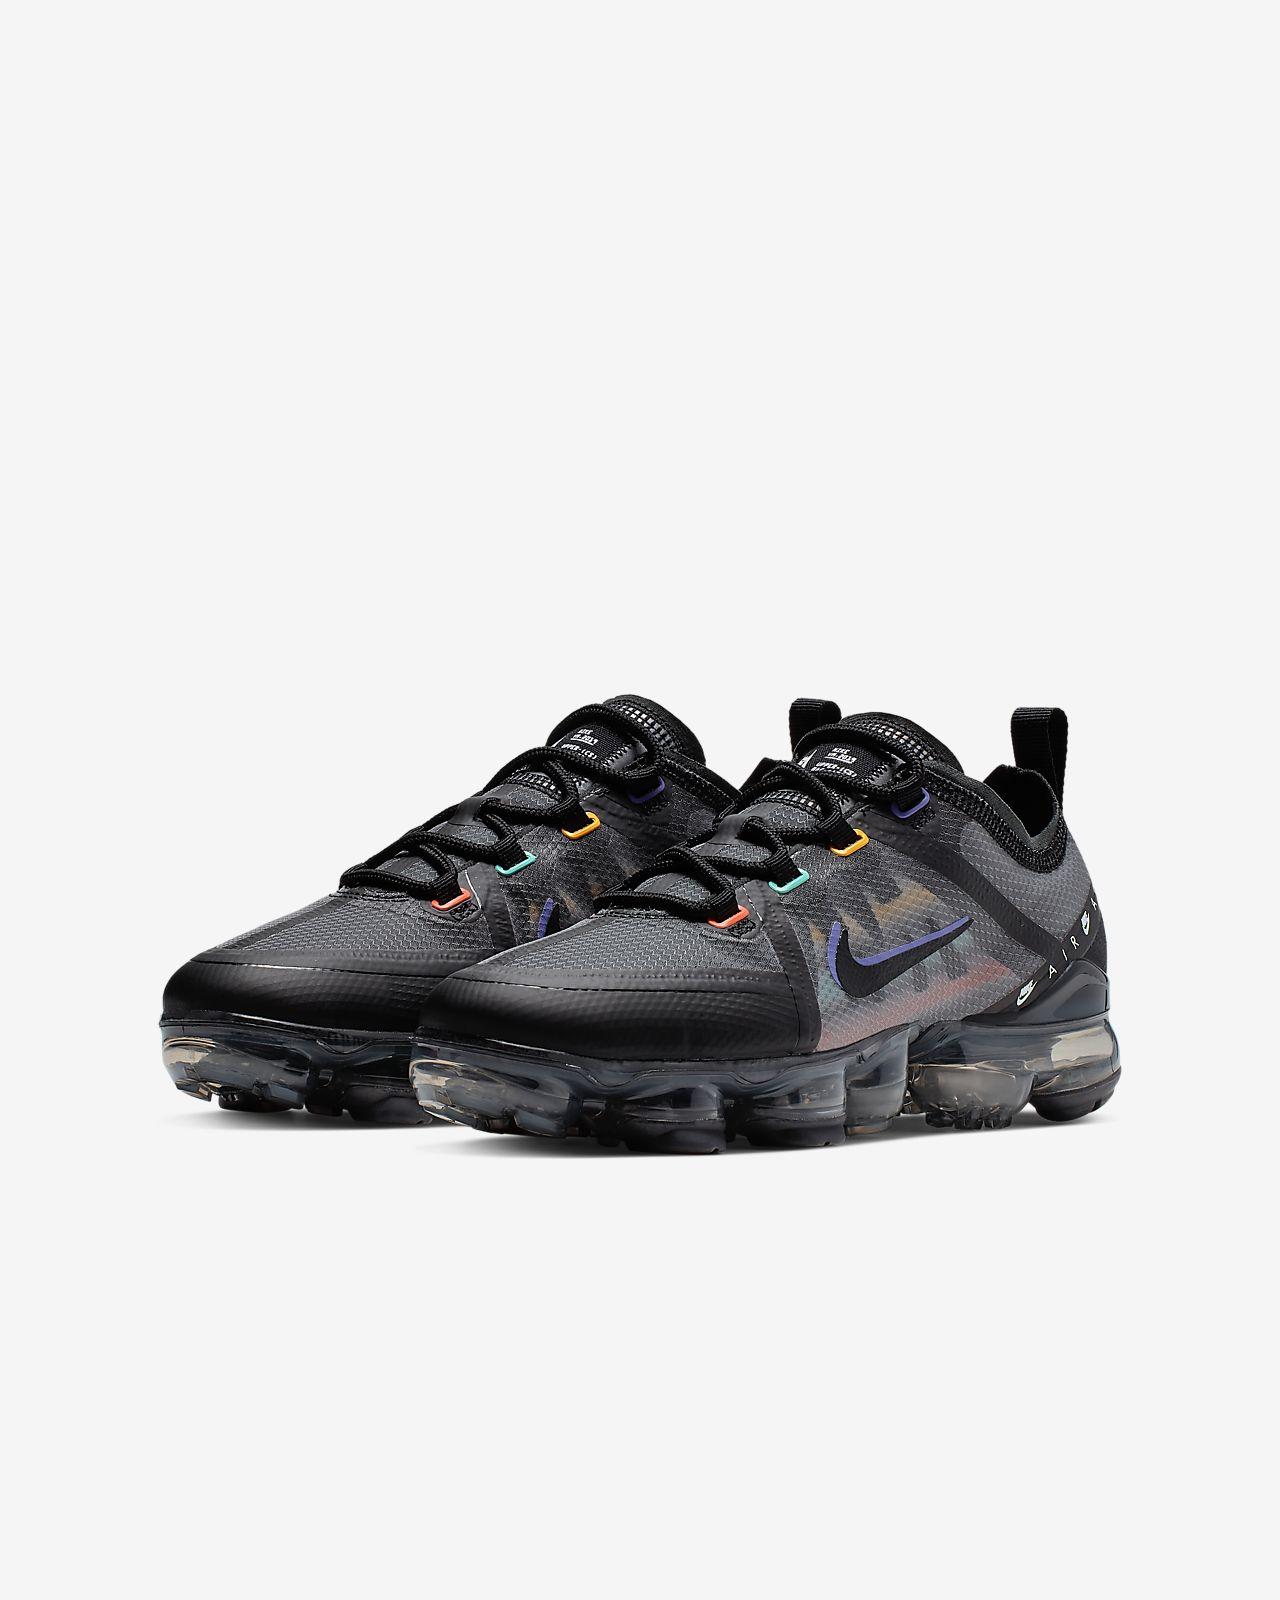 huge discount 0e472 a1e58 Nike Air VaporMax 2019 Game Change Older Kids' Shoe